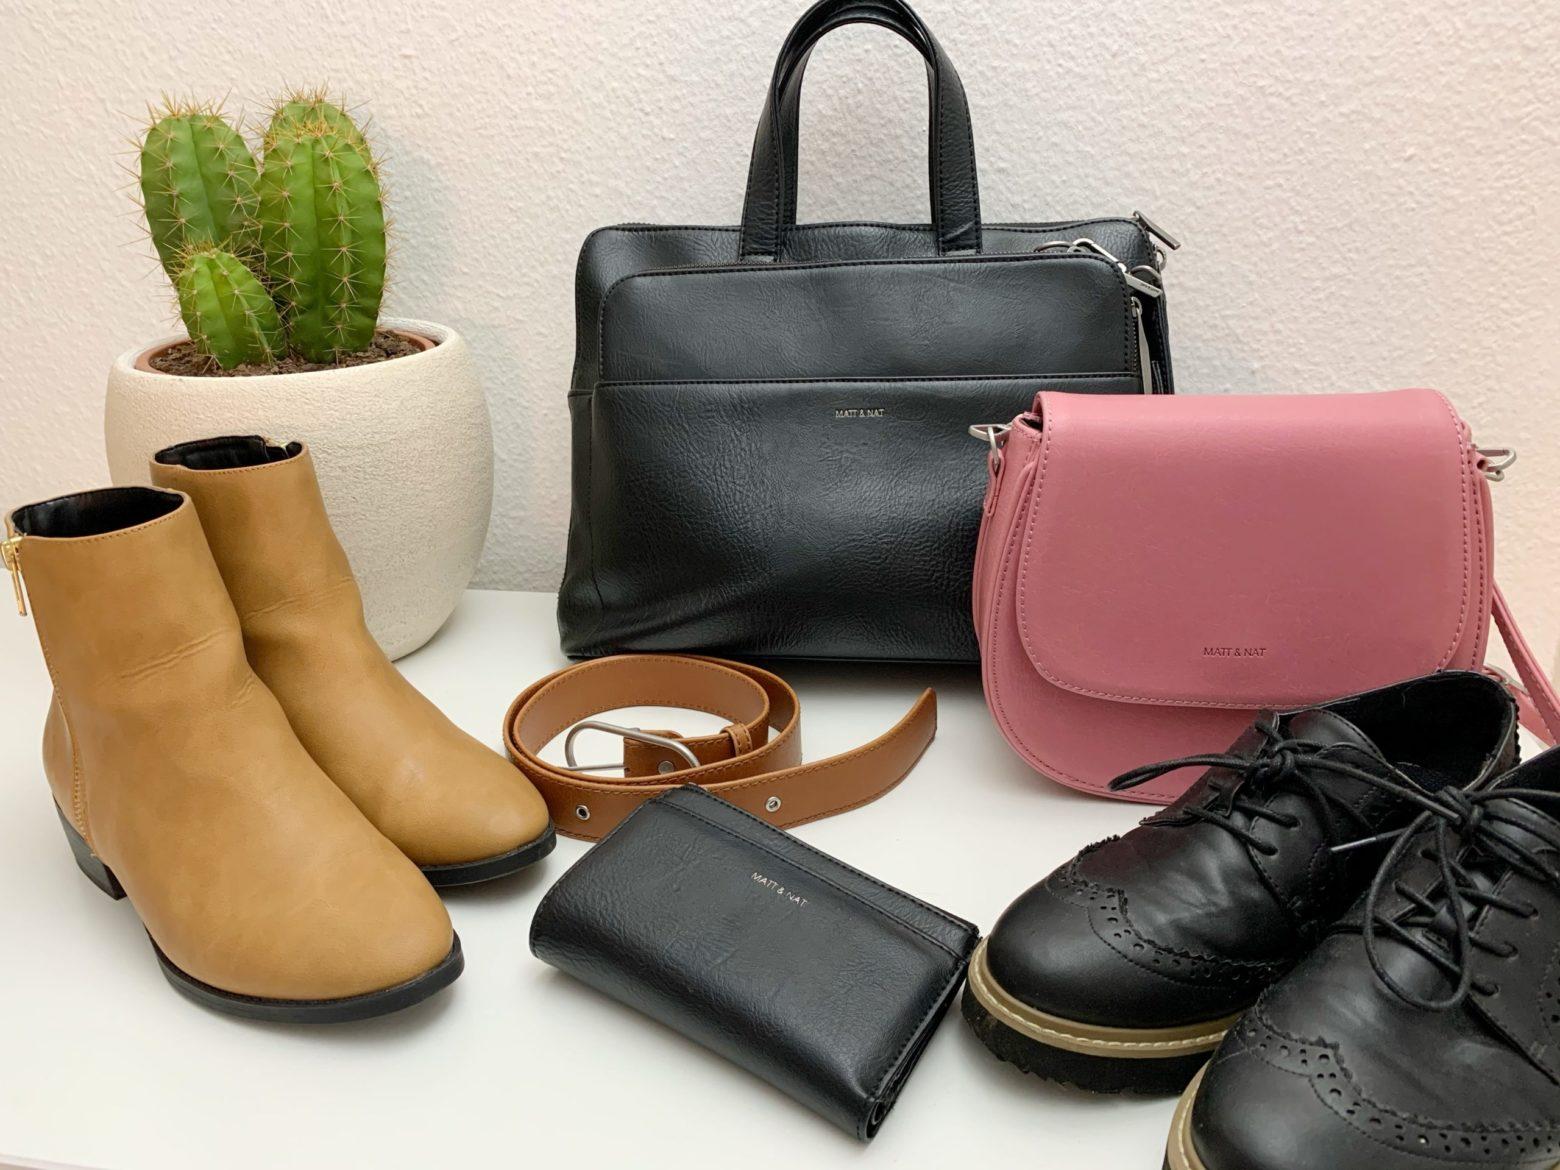 Vegane Schuhe, Taschen und Accessoires | Matt & Nat Review